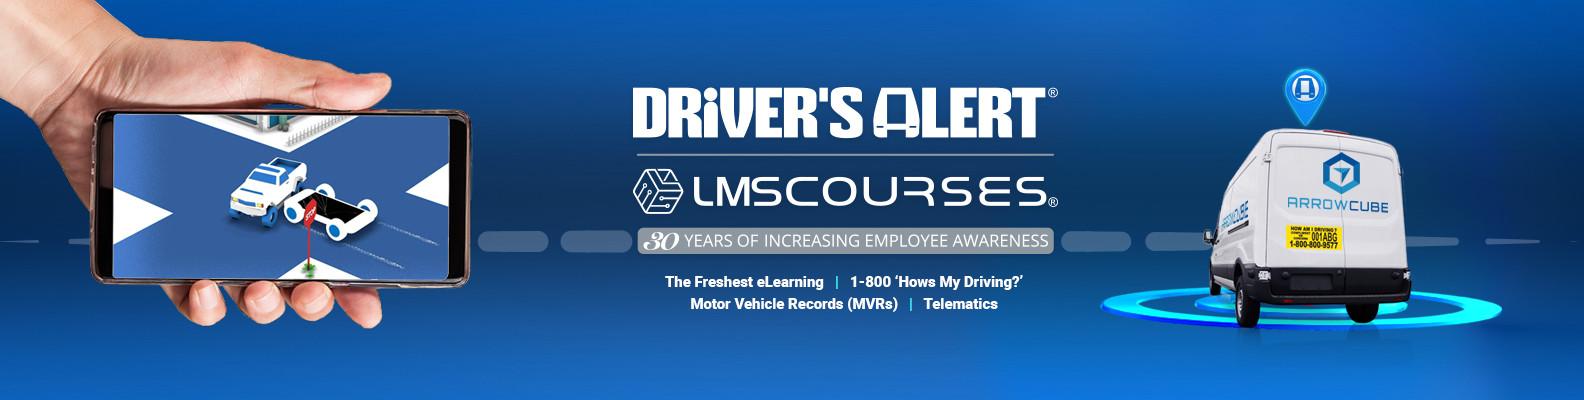 drivers-alert-safety-alliance